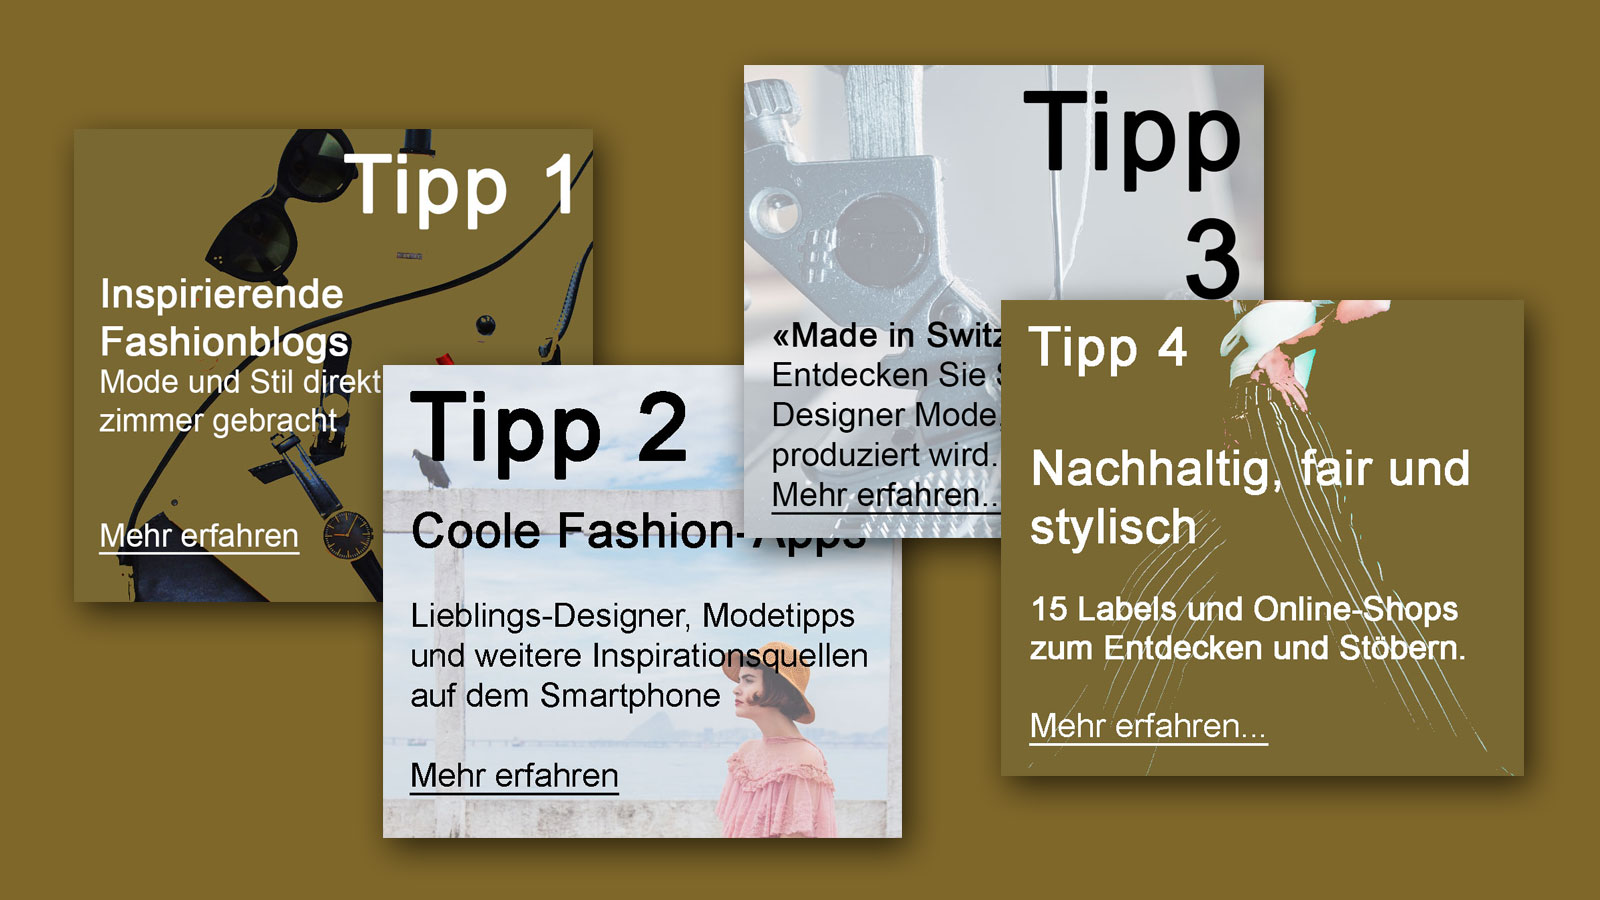 IN KÜRZE – Tipps zum Thema Fashion